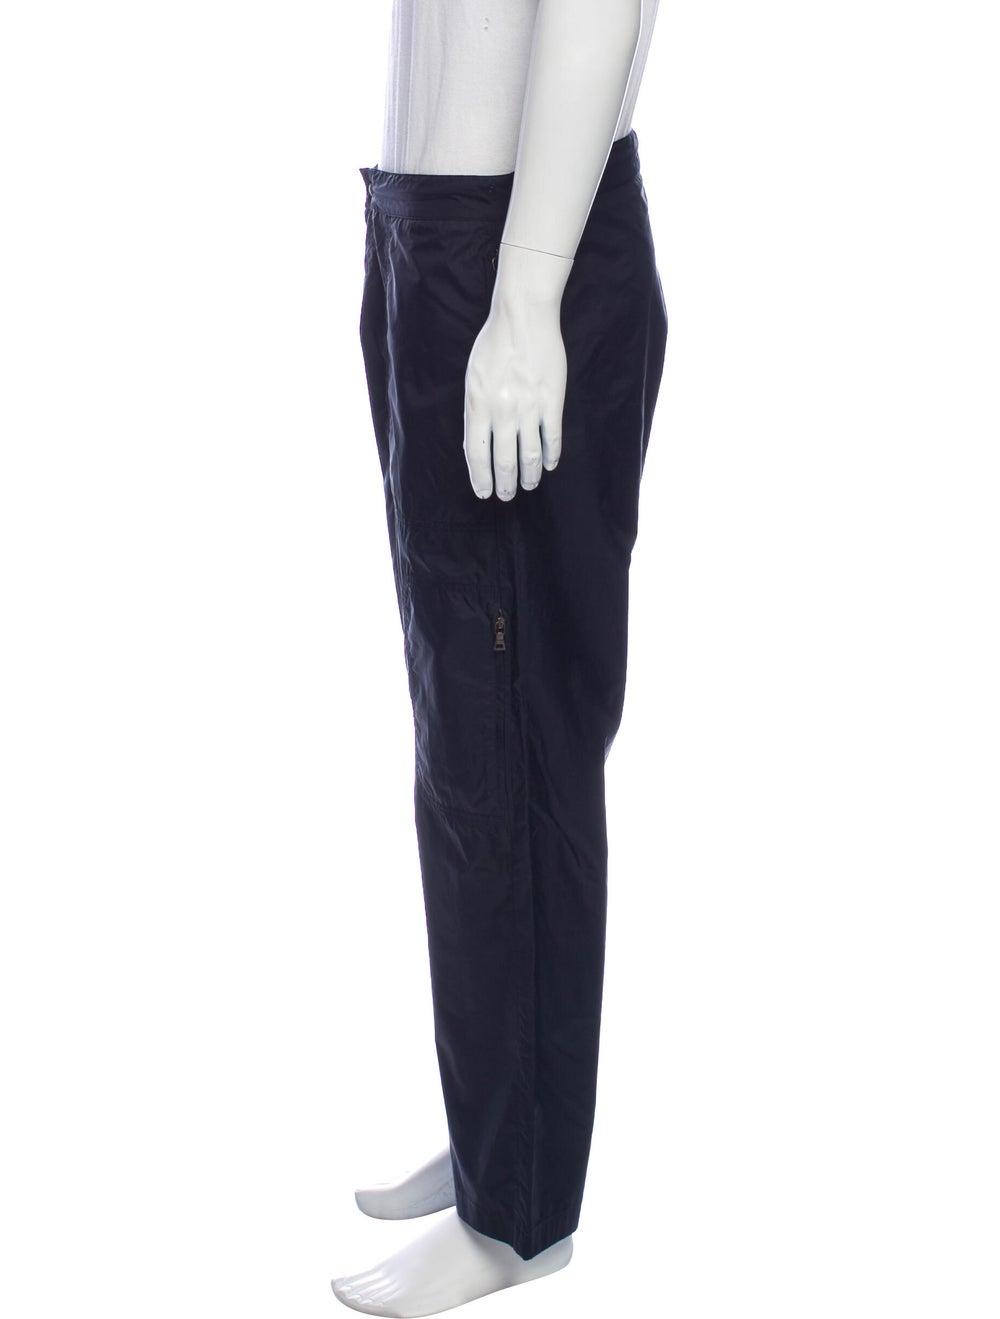 Prada Pants Blue - image 2